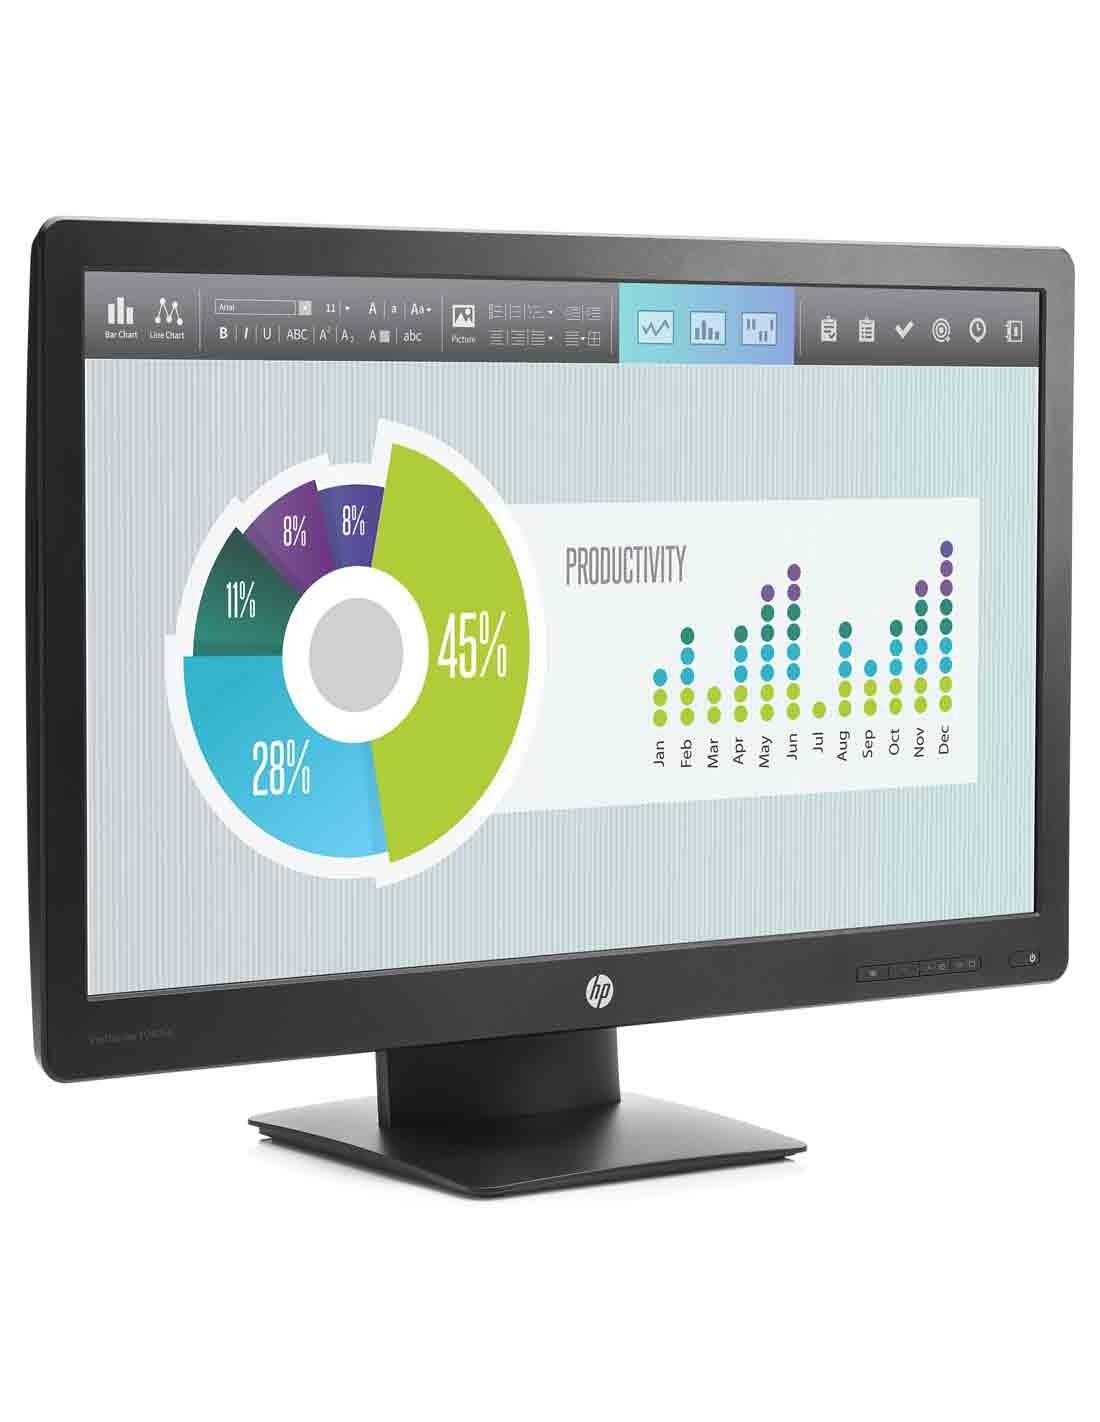 HP ProDisplay P240va 23.8-inch Monitor images